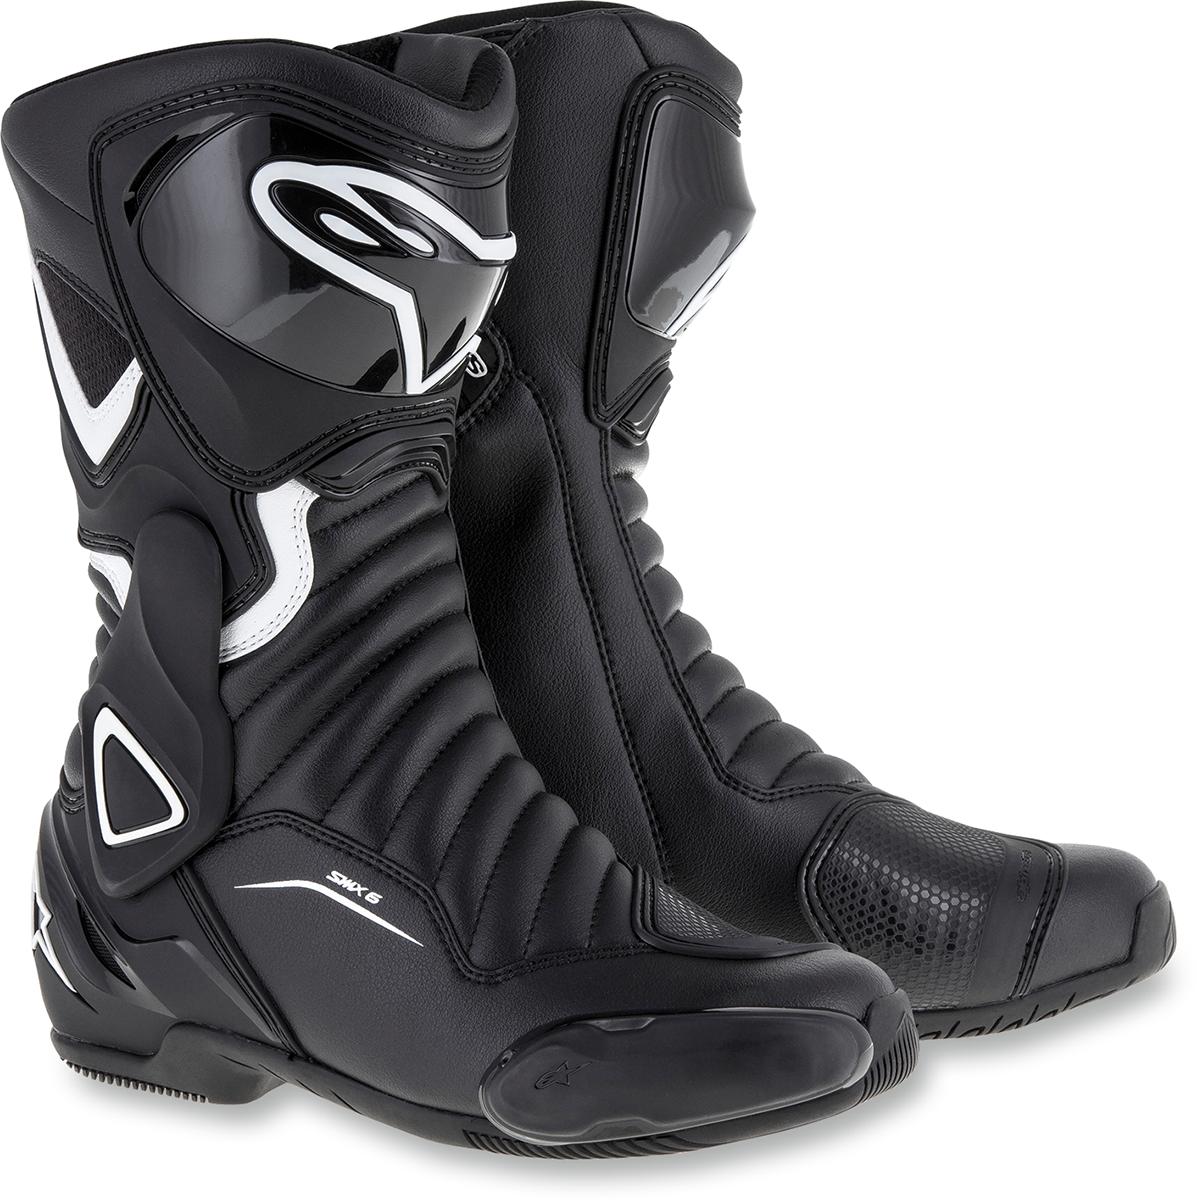 Alpinestars Pair Black White SMX6 Womens Motorcycle Riding Street Racing Boots